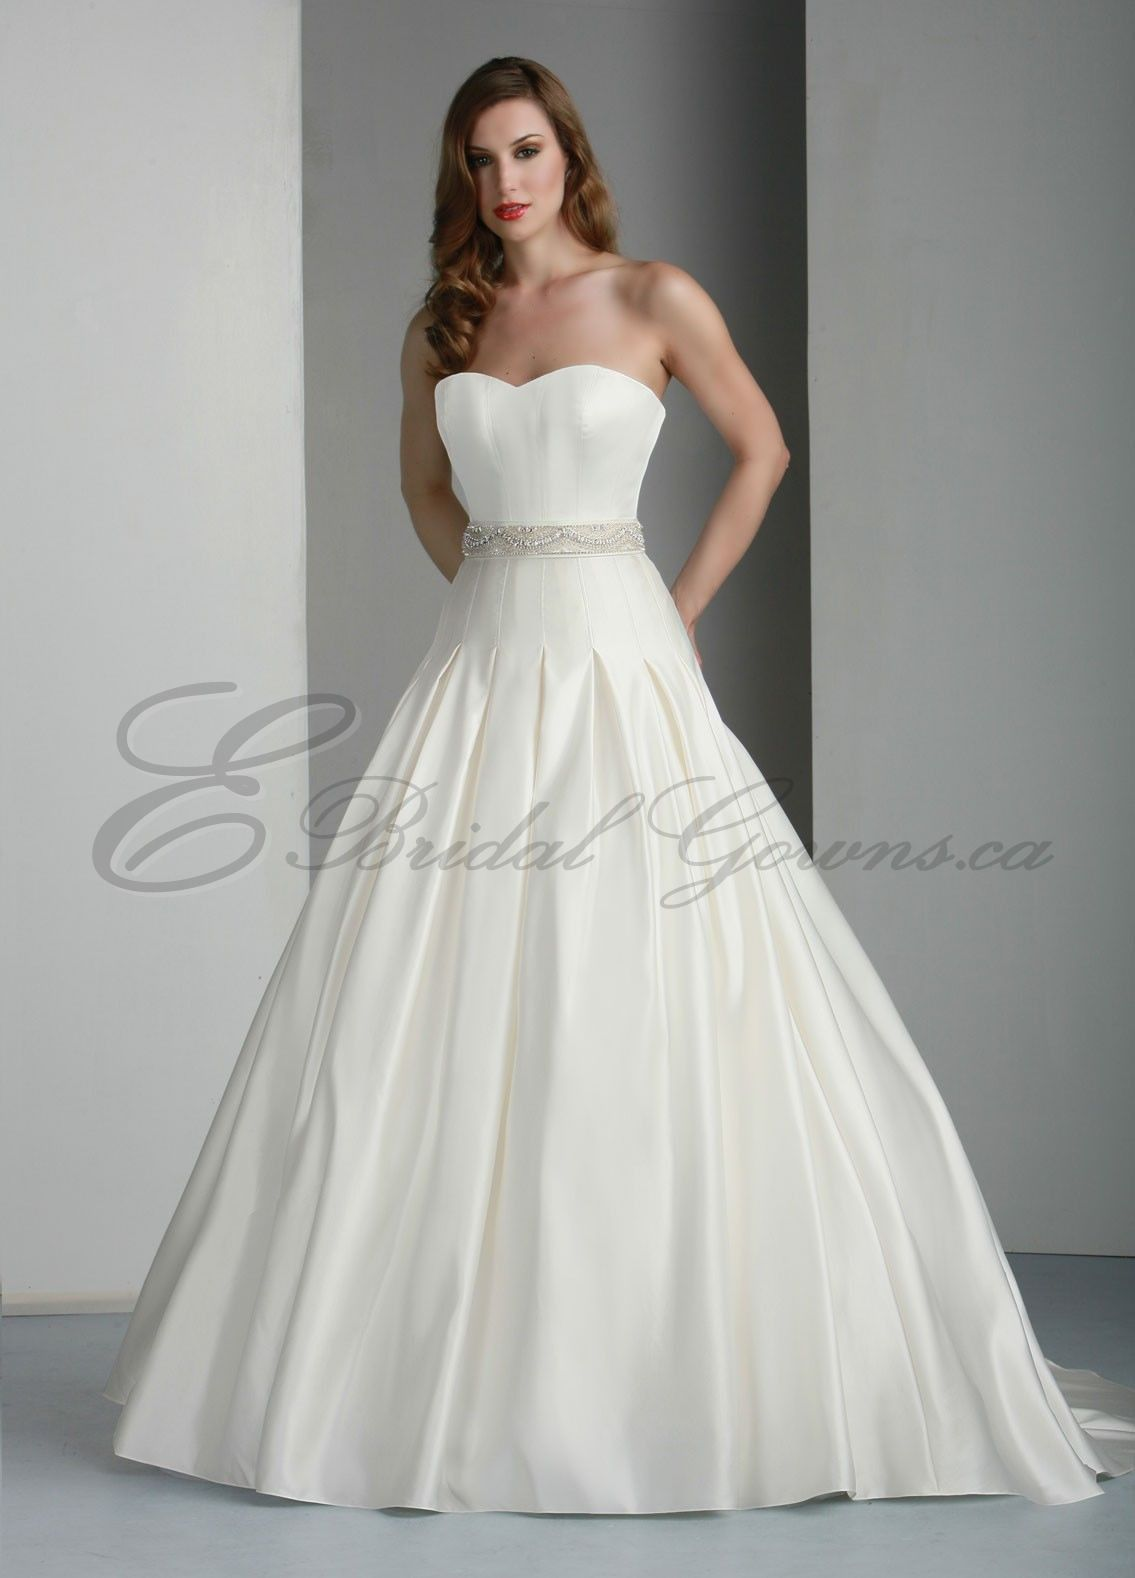 satin strapless sweetheart ball gown wedding dress canada wedding dresses shop